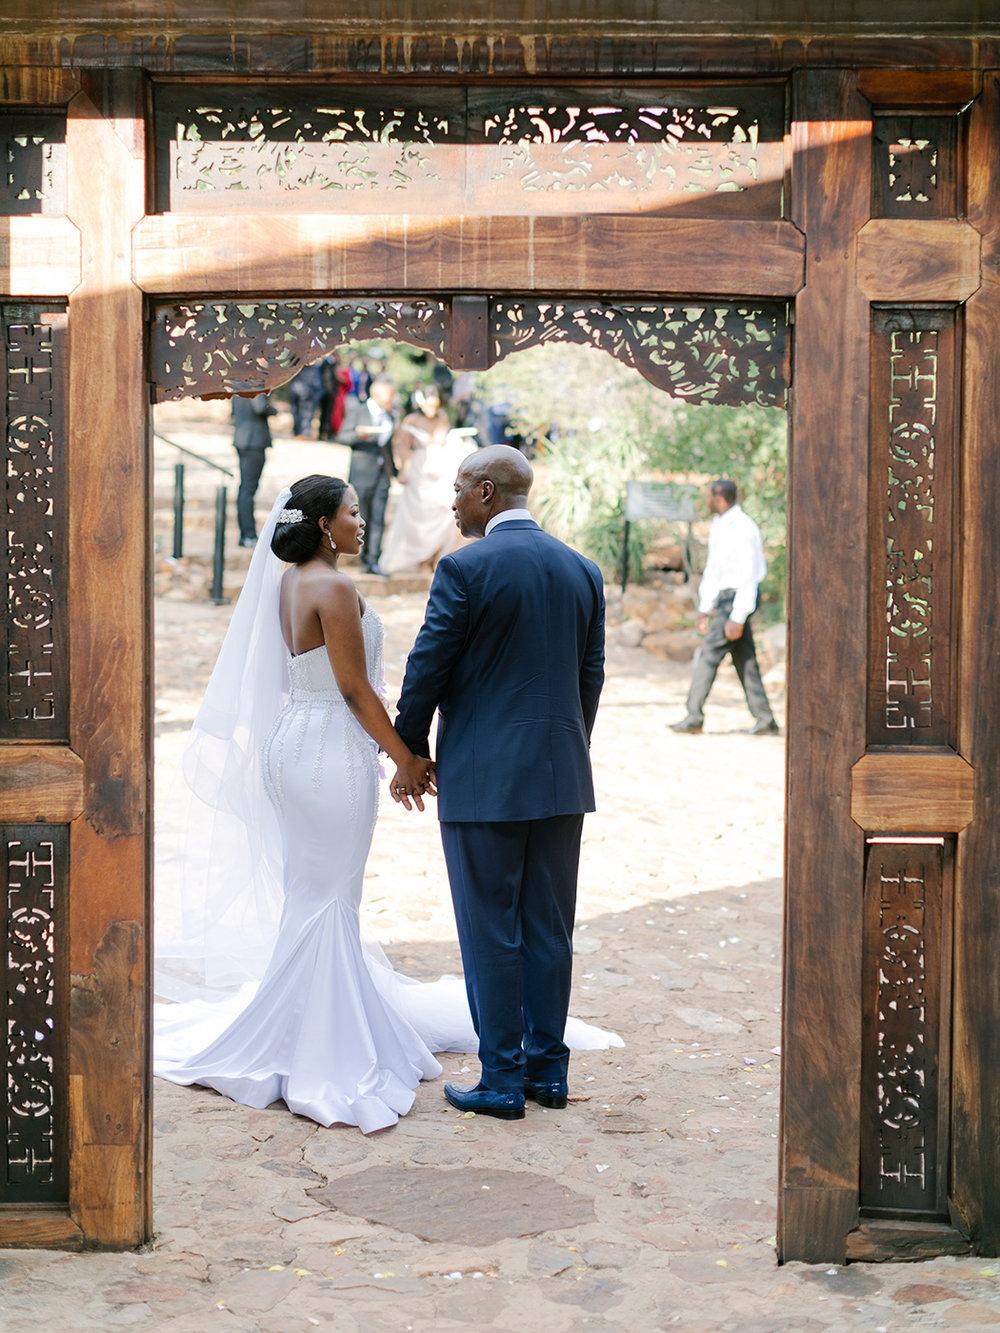 Father & Bride   Rensche Mari Photography